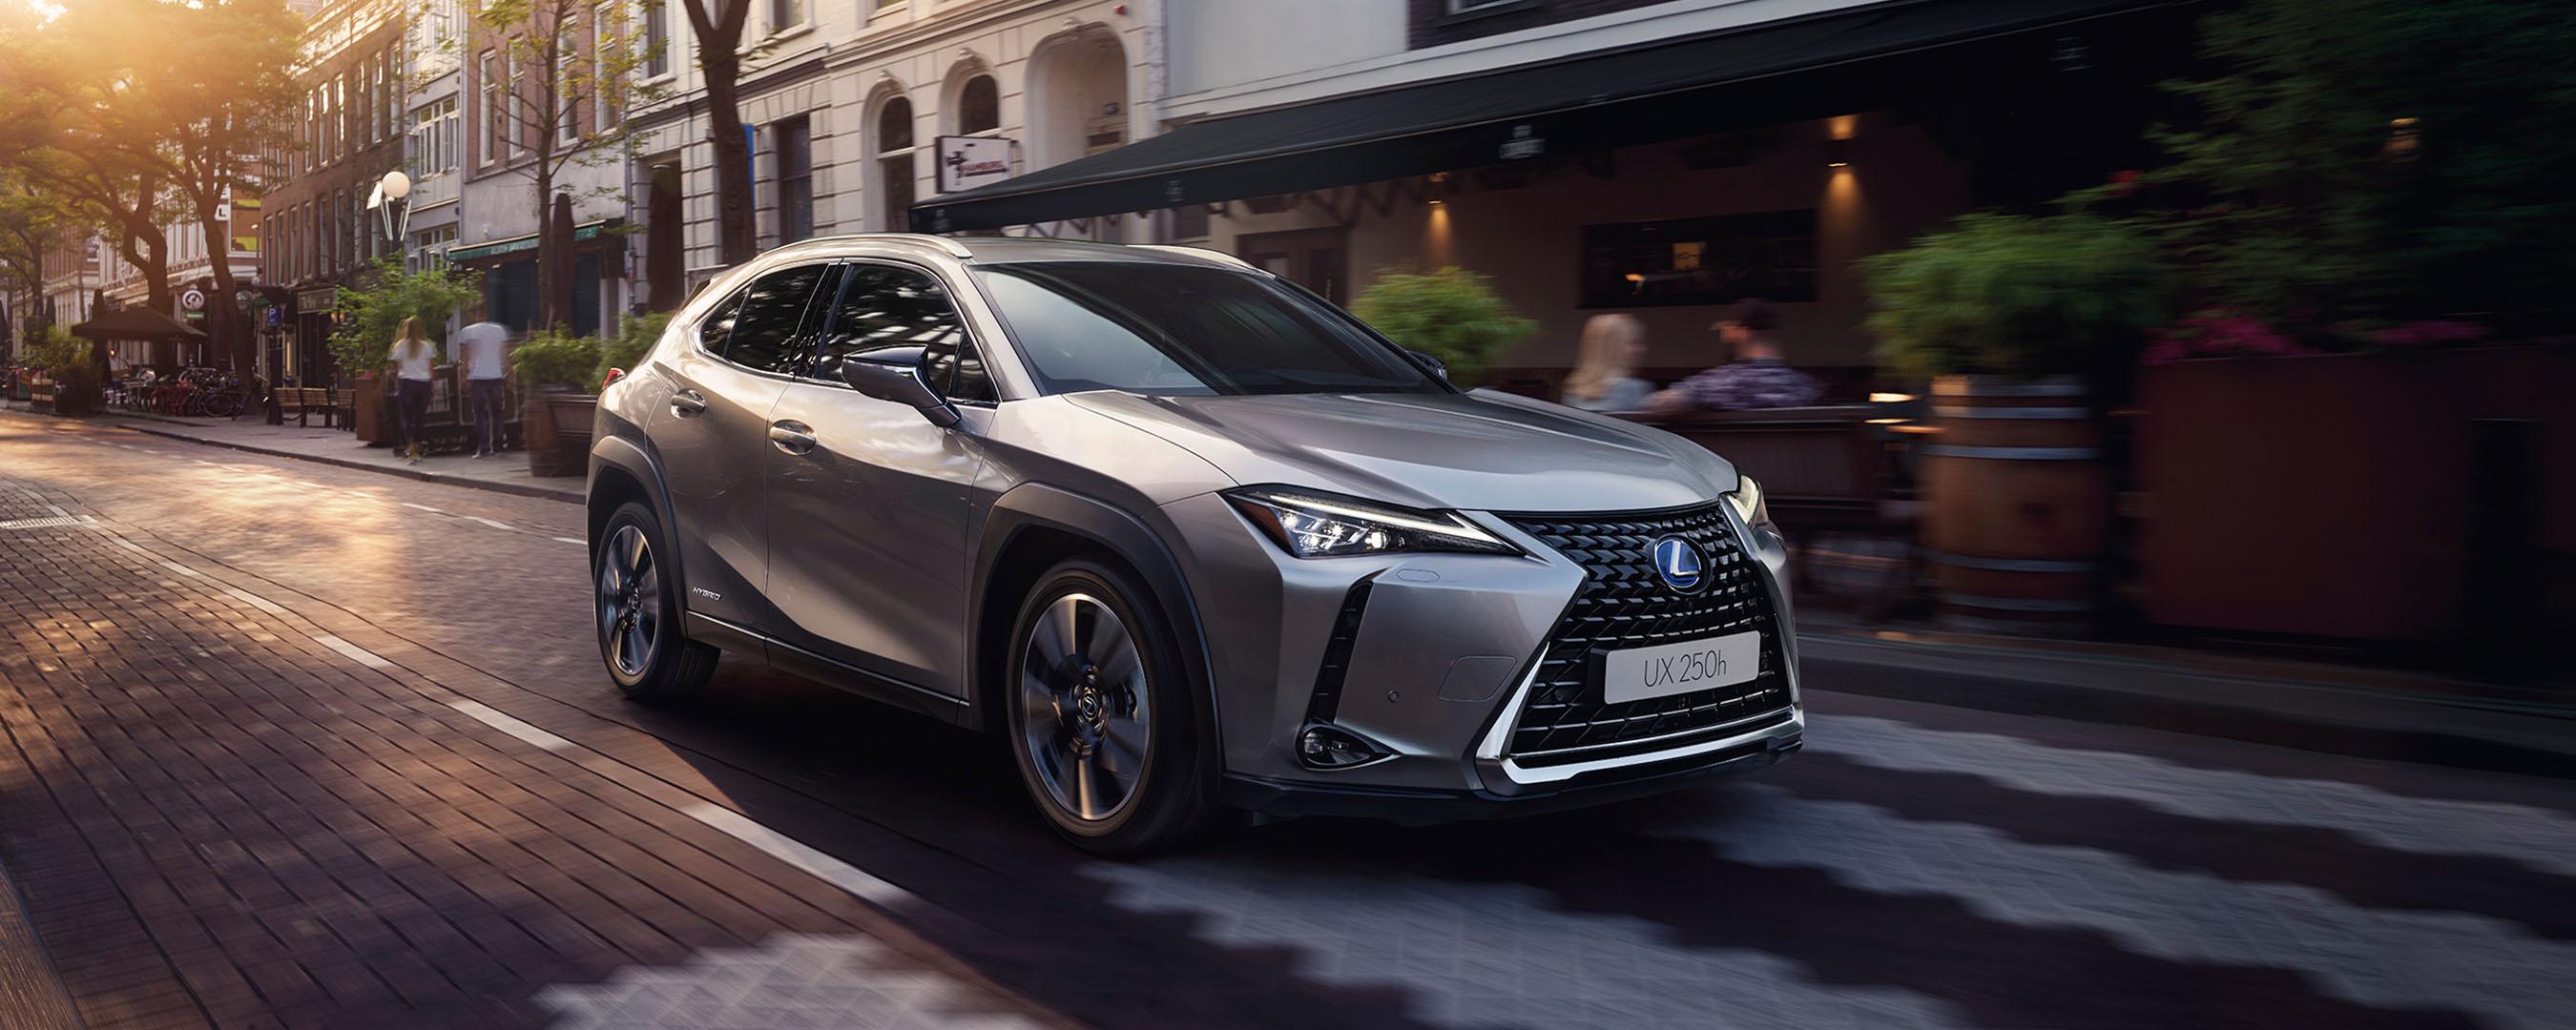 2018 lexus ux htbrid experience front exterior